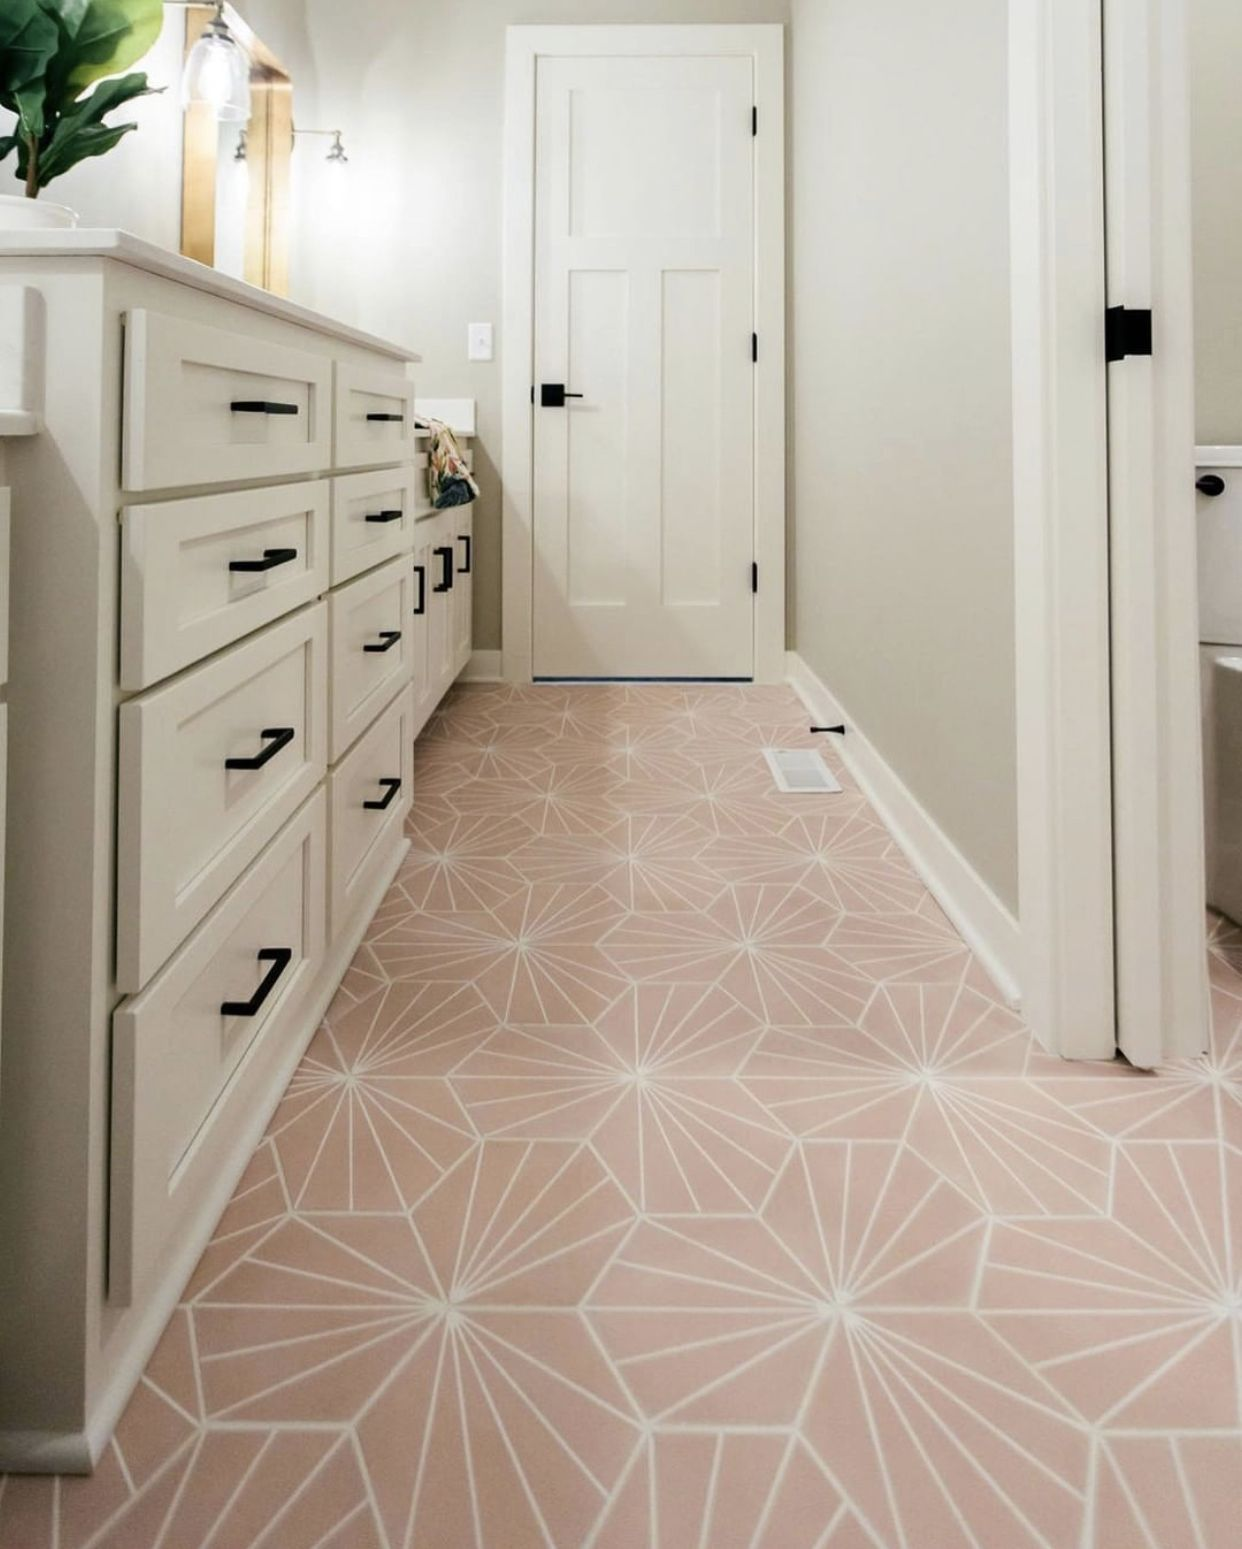 Riad Tile Cement Tile Nola Pink Pink Bathroom Tiles Cement